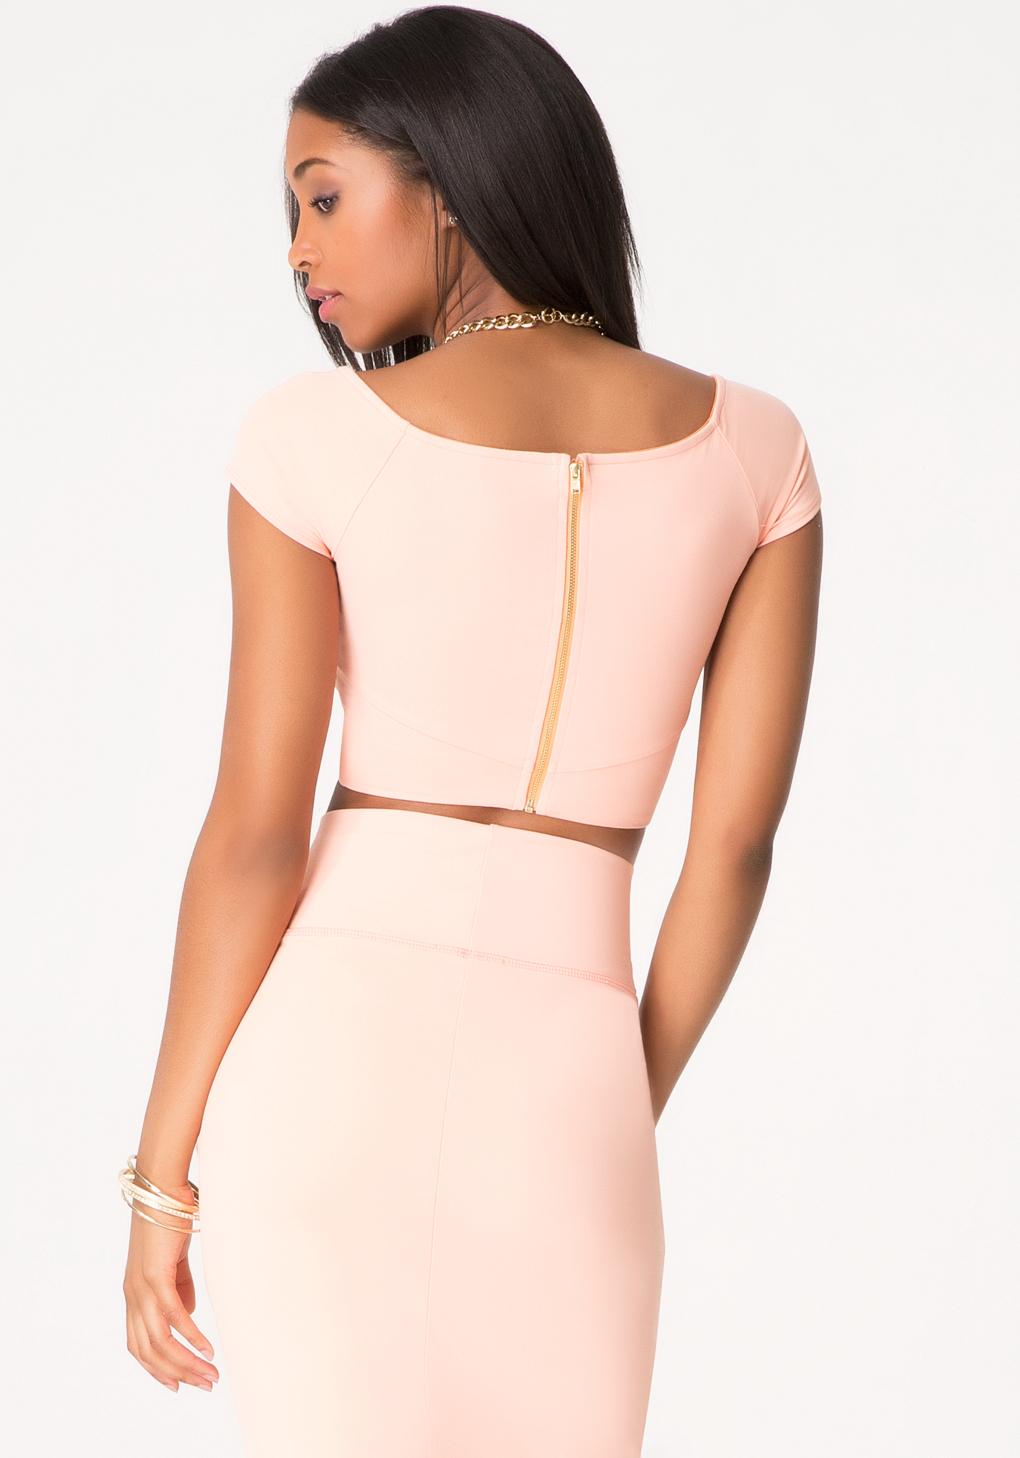 30f82d68a26dd5 Bebe Off Shoulder Wrap Crop Top in Pink - Lyst